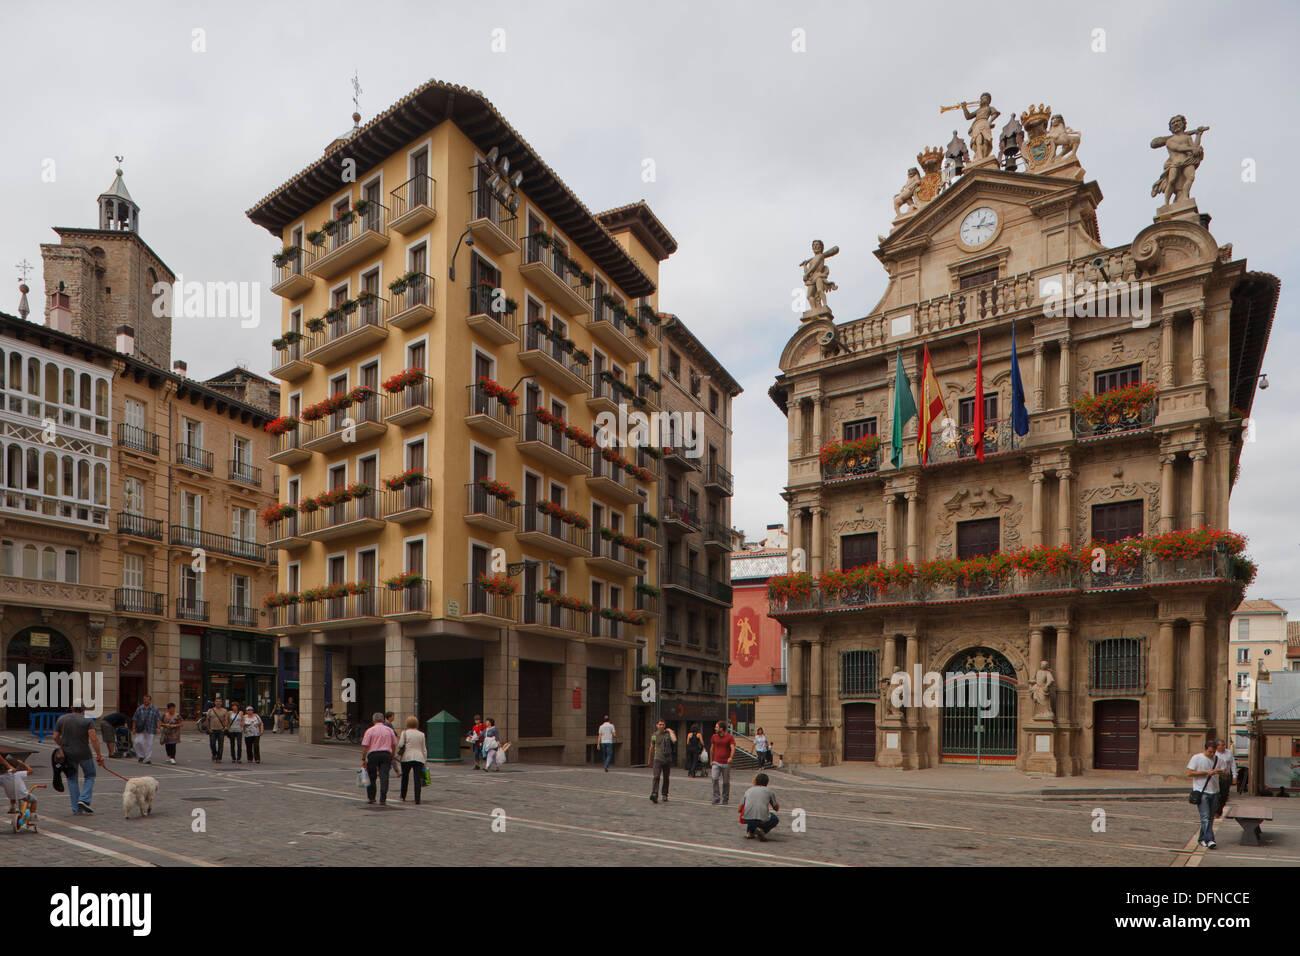 View of the town hall, Pamplona, Camino Frances, Way of St. James, Camino de Santiago, pilgrims way, UNESCO World Heritage, Euro Stock Photo